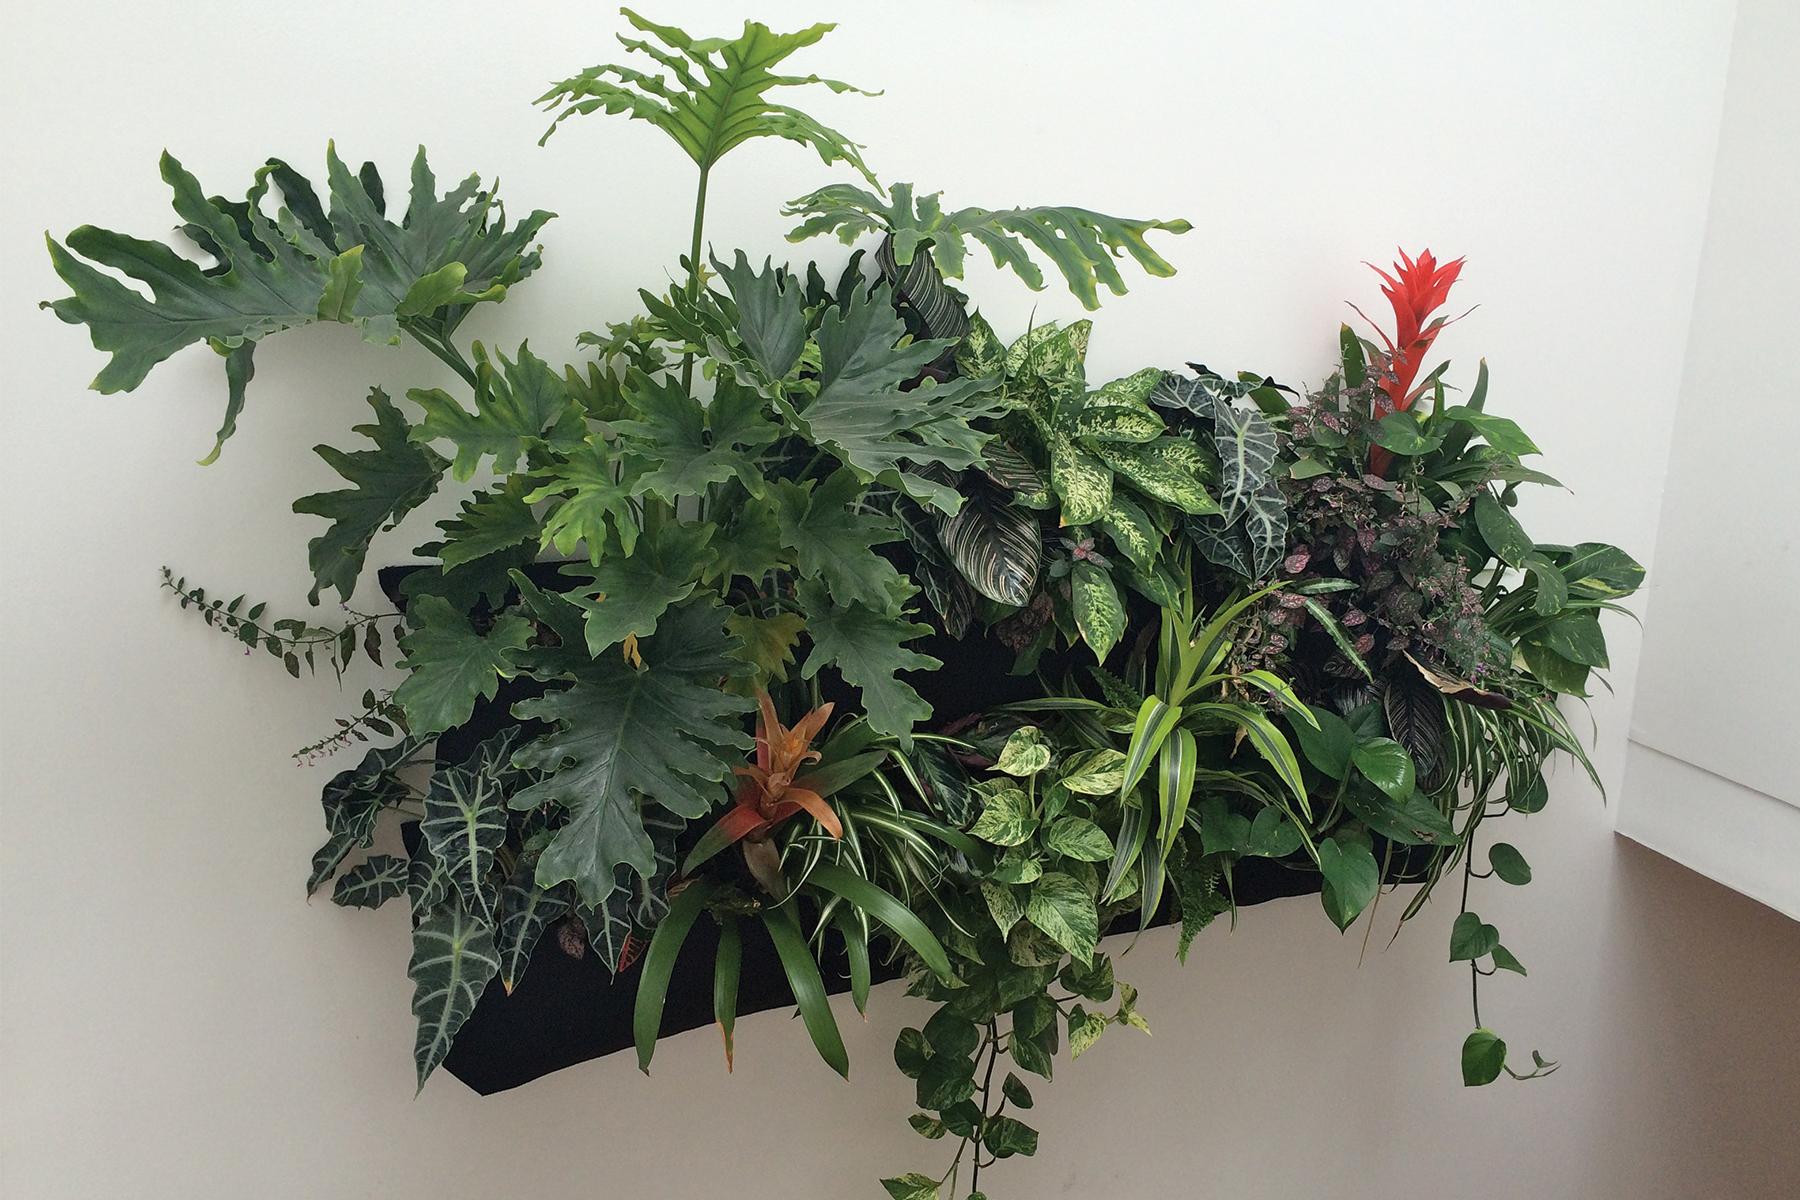 Air-scrubbing low-light tropicals vertical garden by Amanda Goldberg Planted Design.